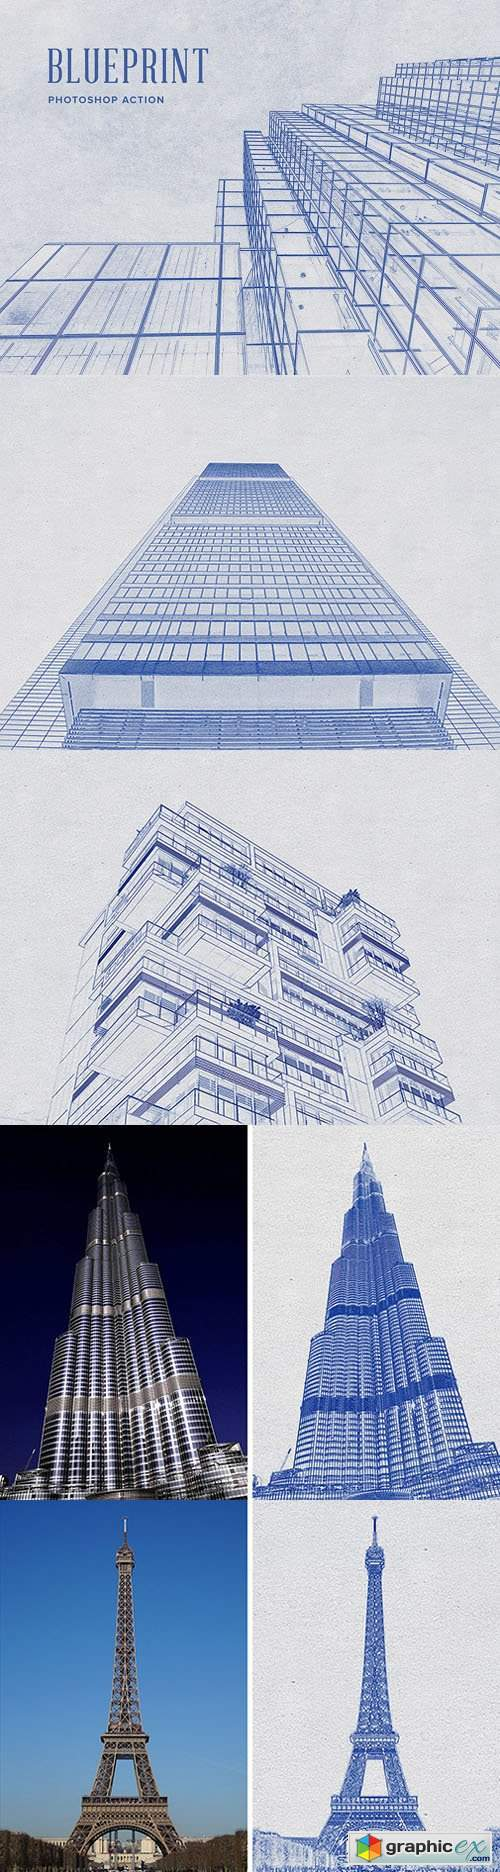 Blueprint Action for Photoshop